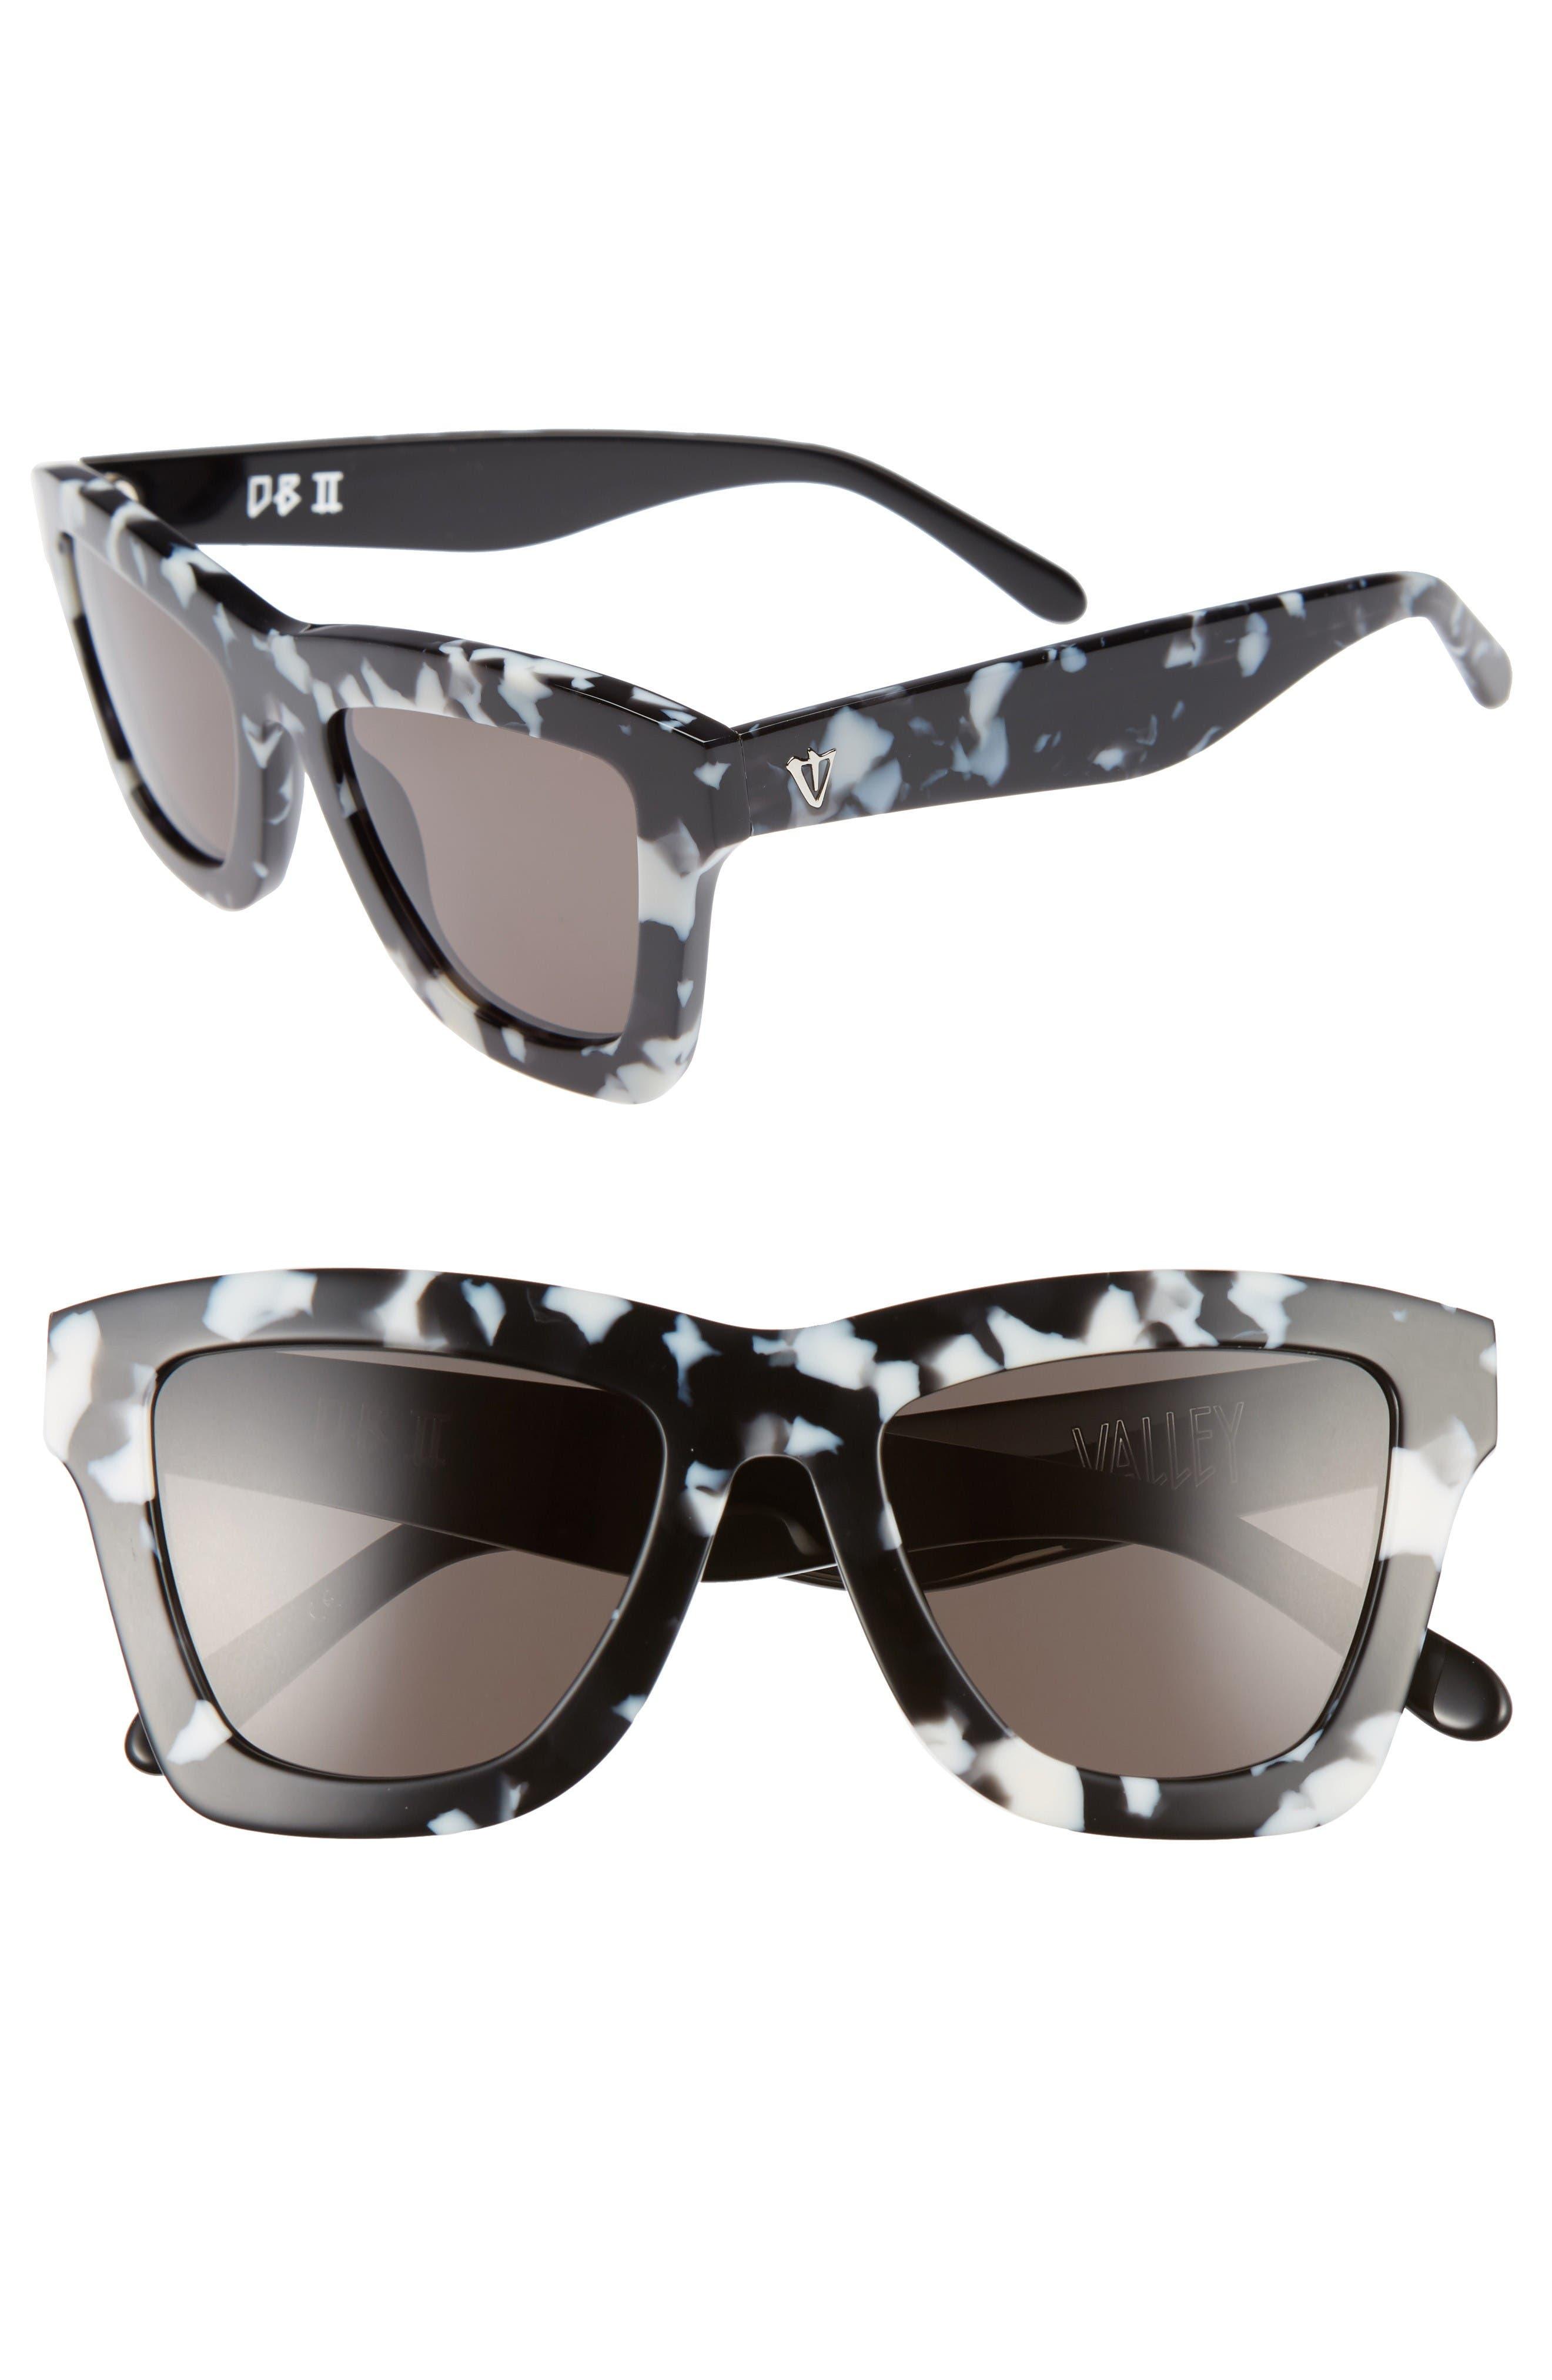 DB II 50mm Retro Sunglasses,                             Main thumbnail 1, color,                             Black Marble/ Black